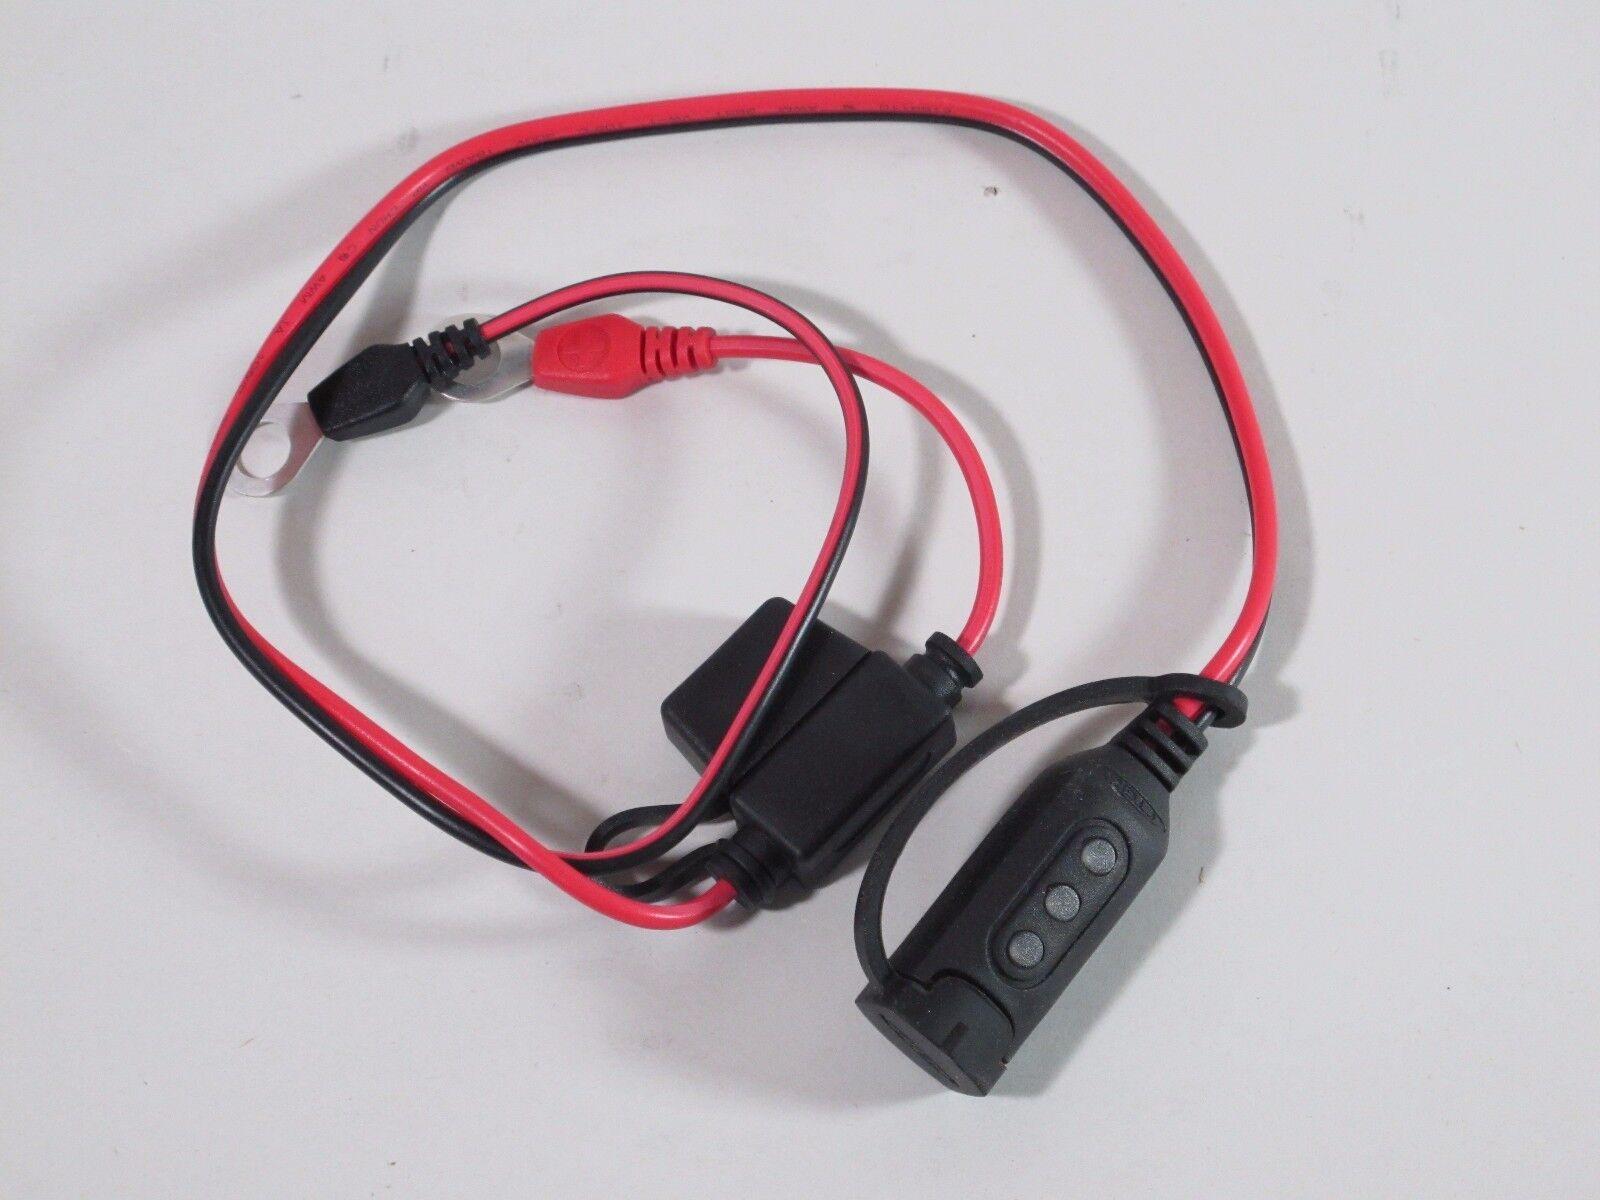 CTEK Comfort Connect Car Battery Level/Status Indicator Eyelet 56-382